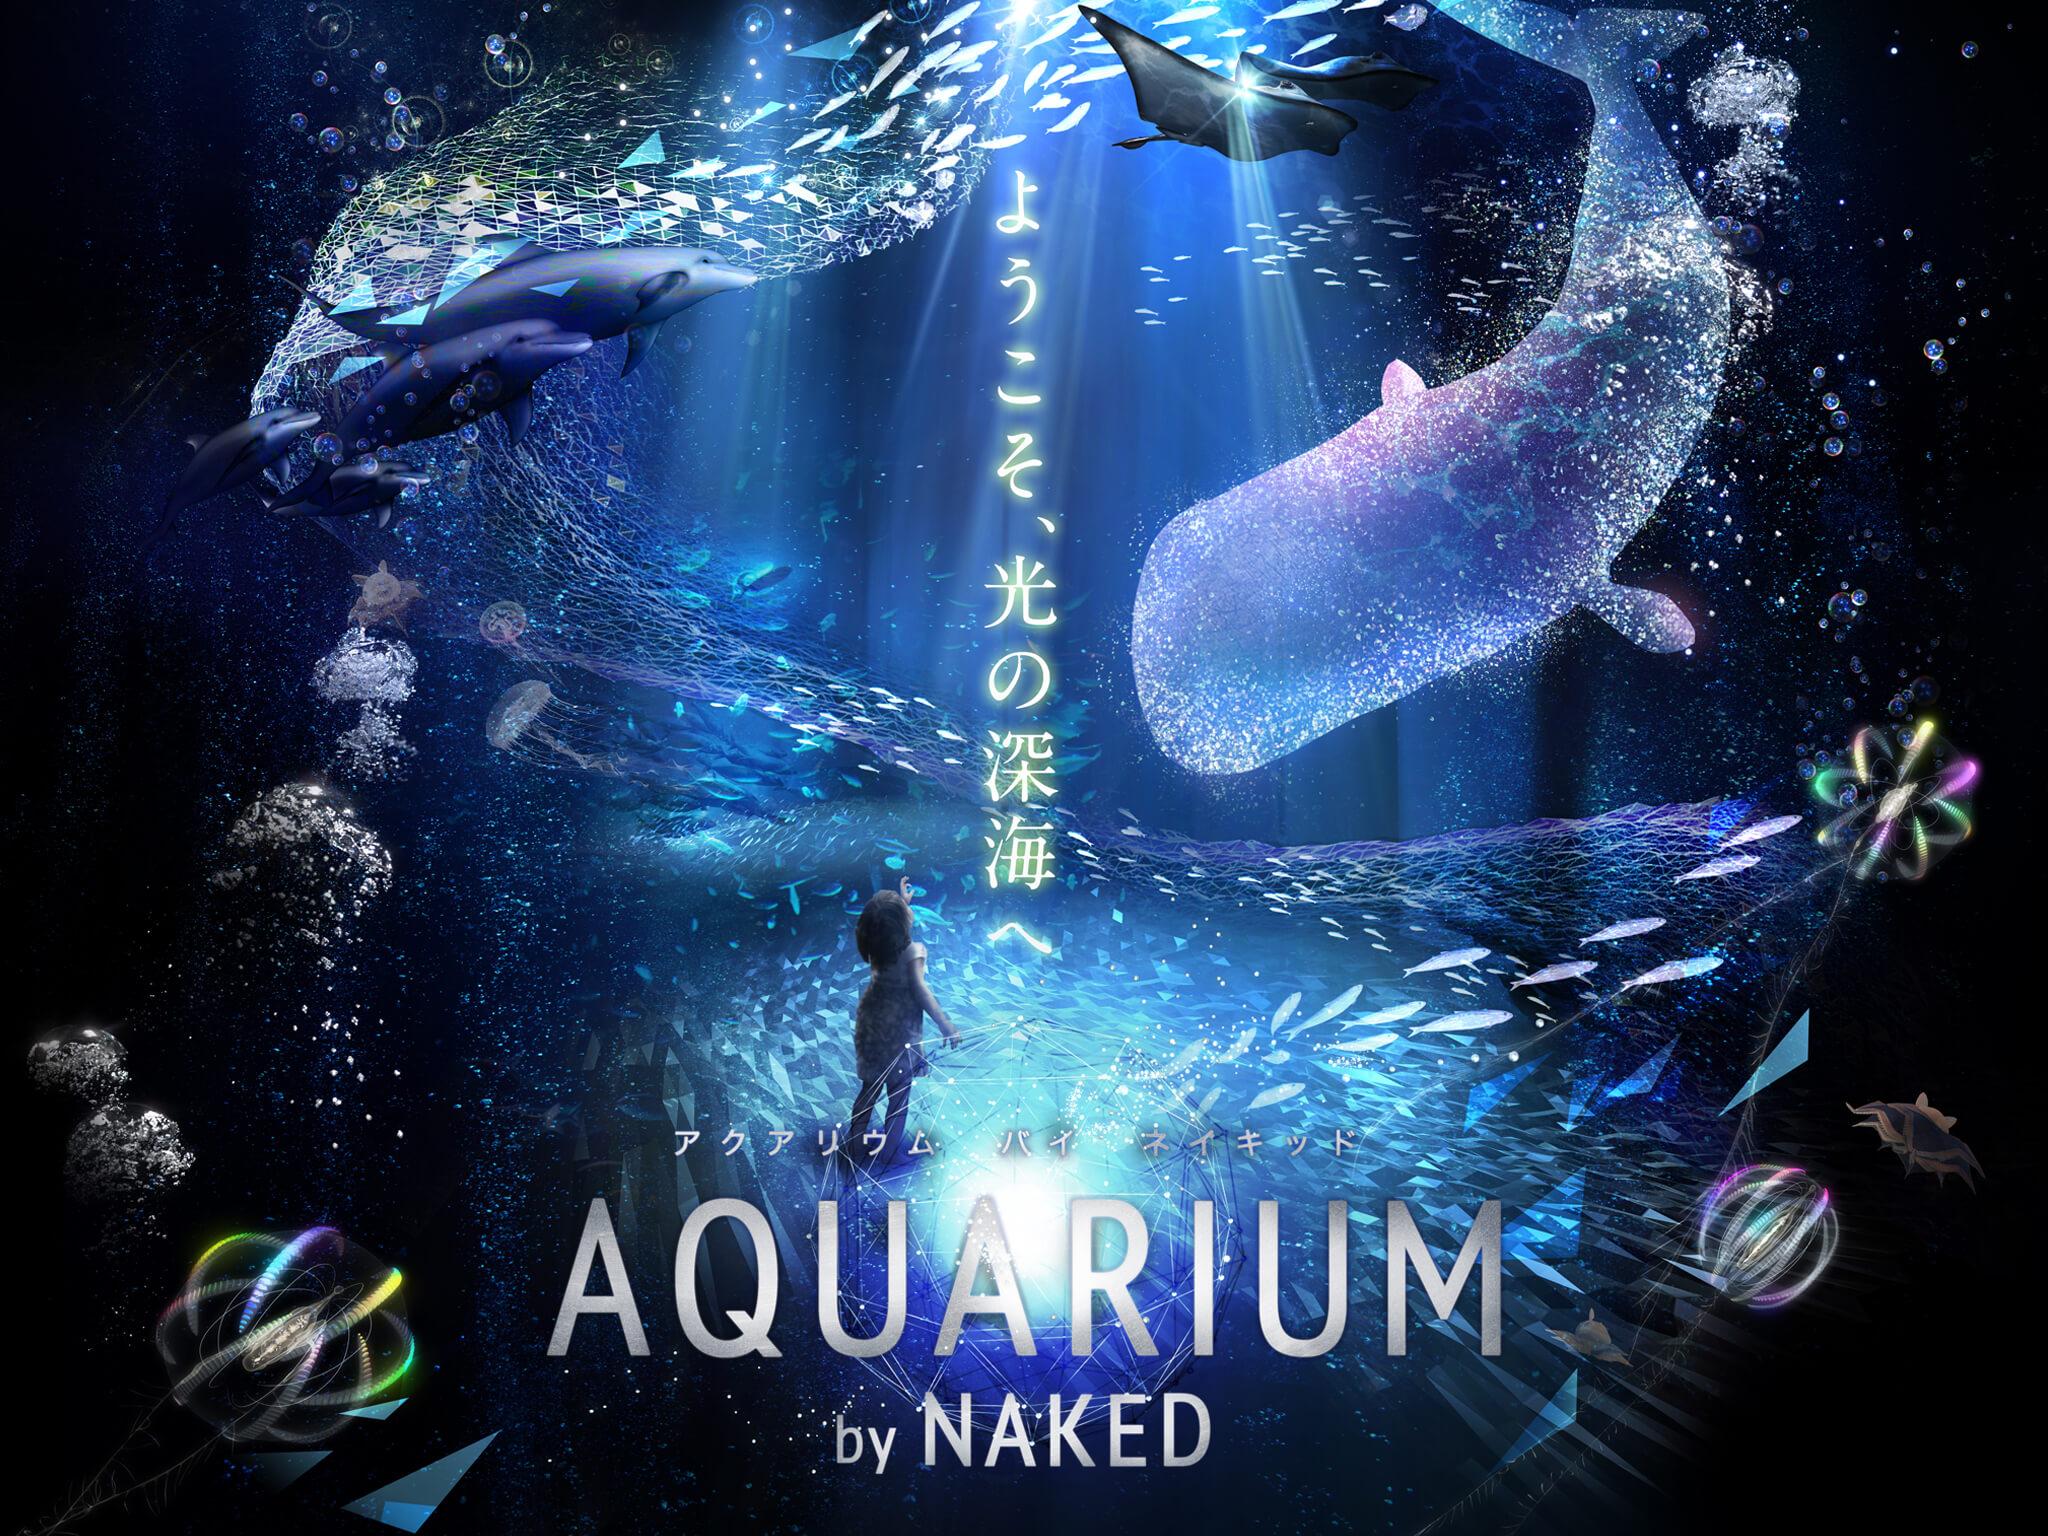 AQUARIUM by NAKED 広島